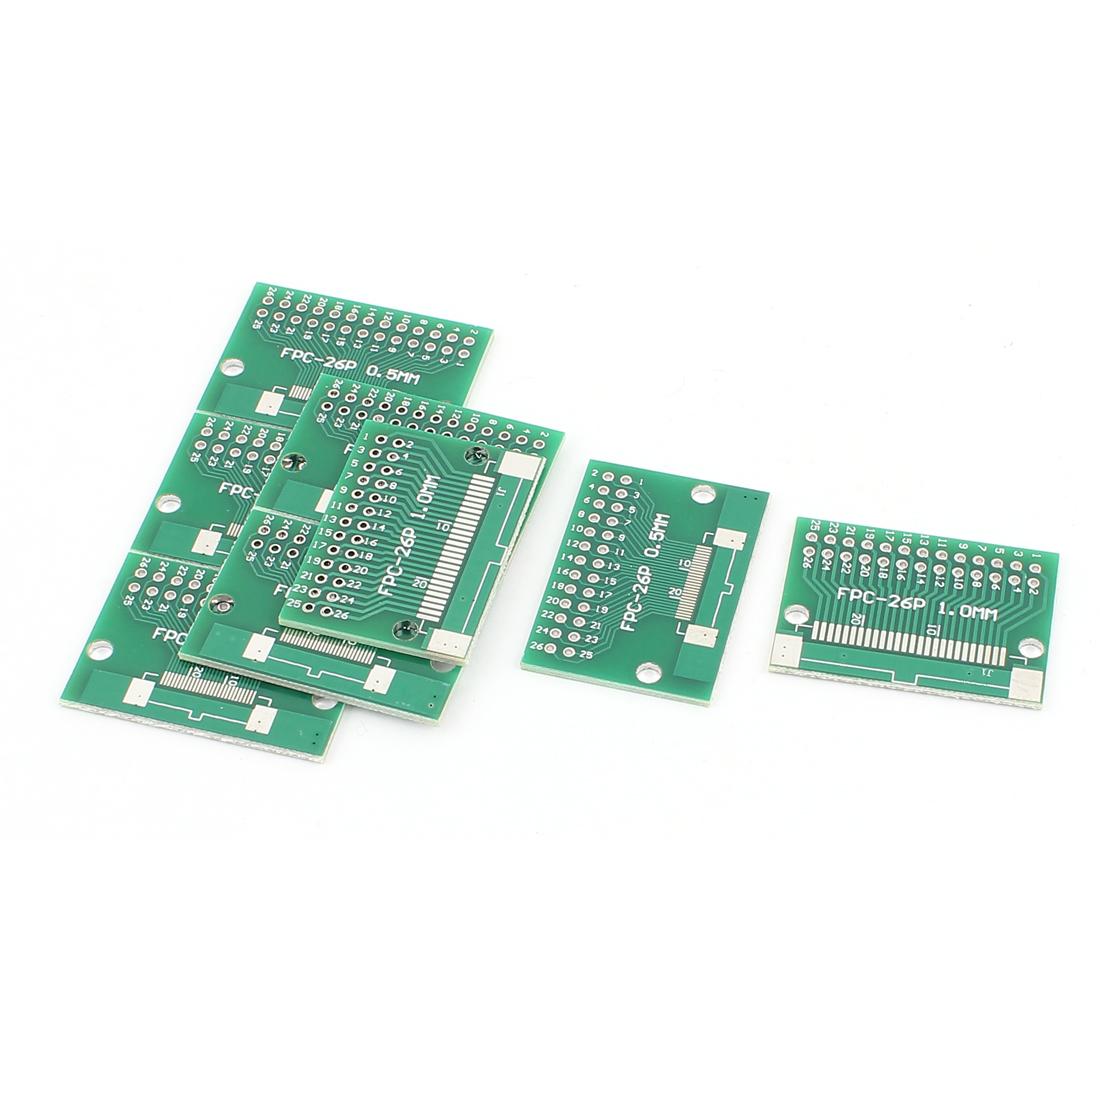 8Pcs 38 x 26mm 26Pins Adapter PCB Converter Board